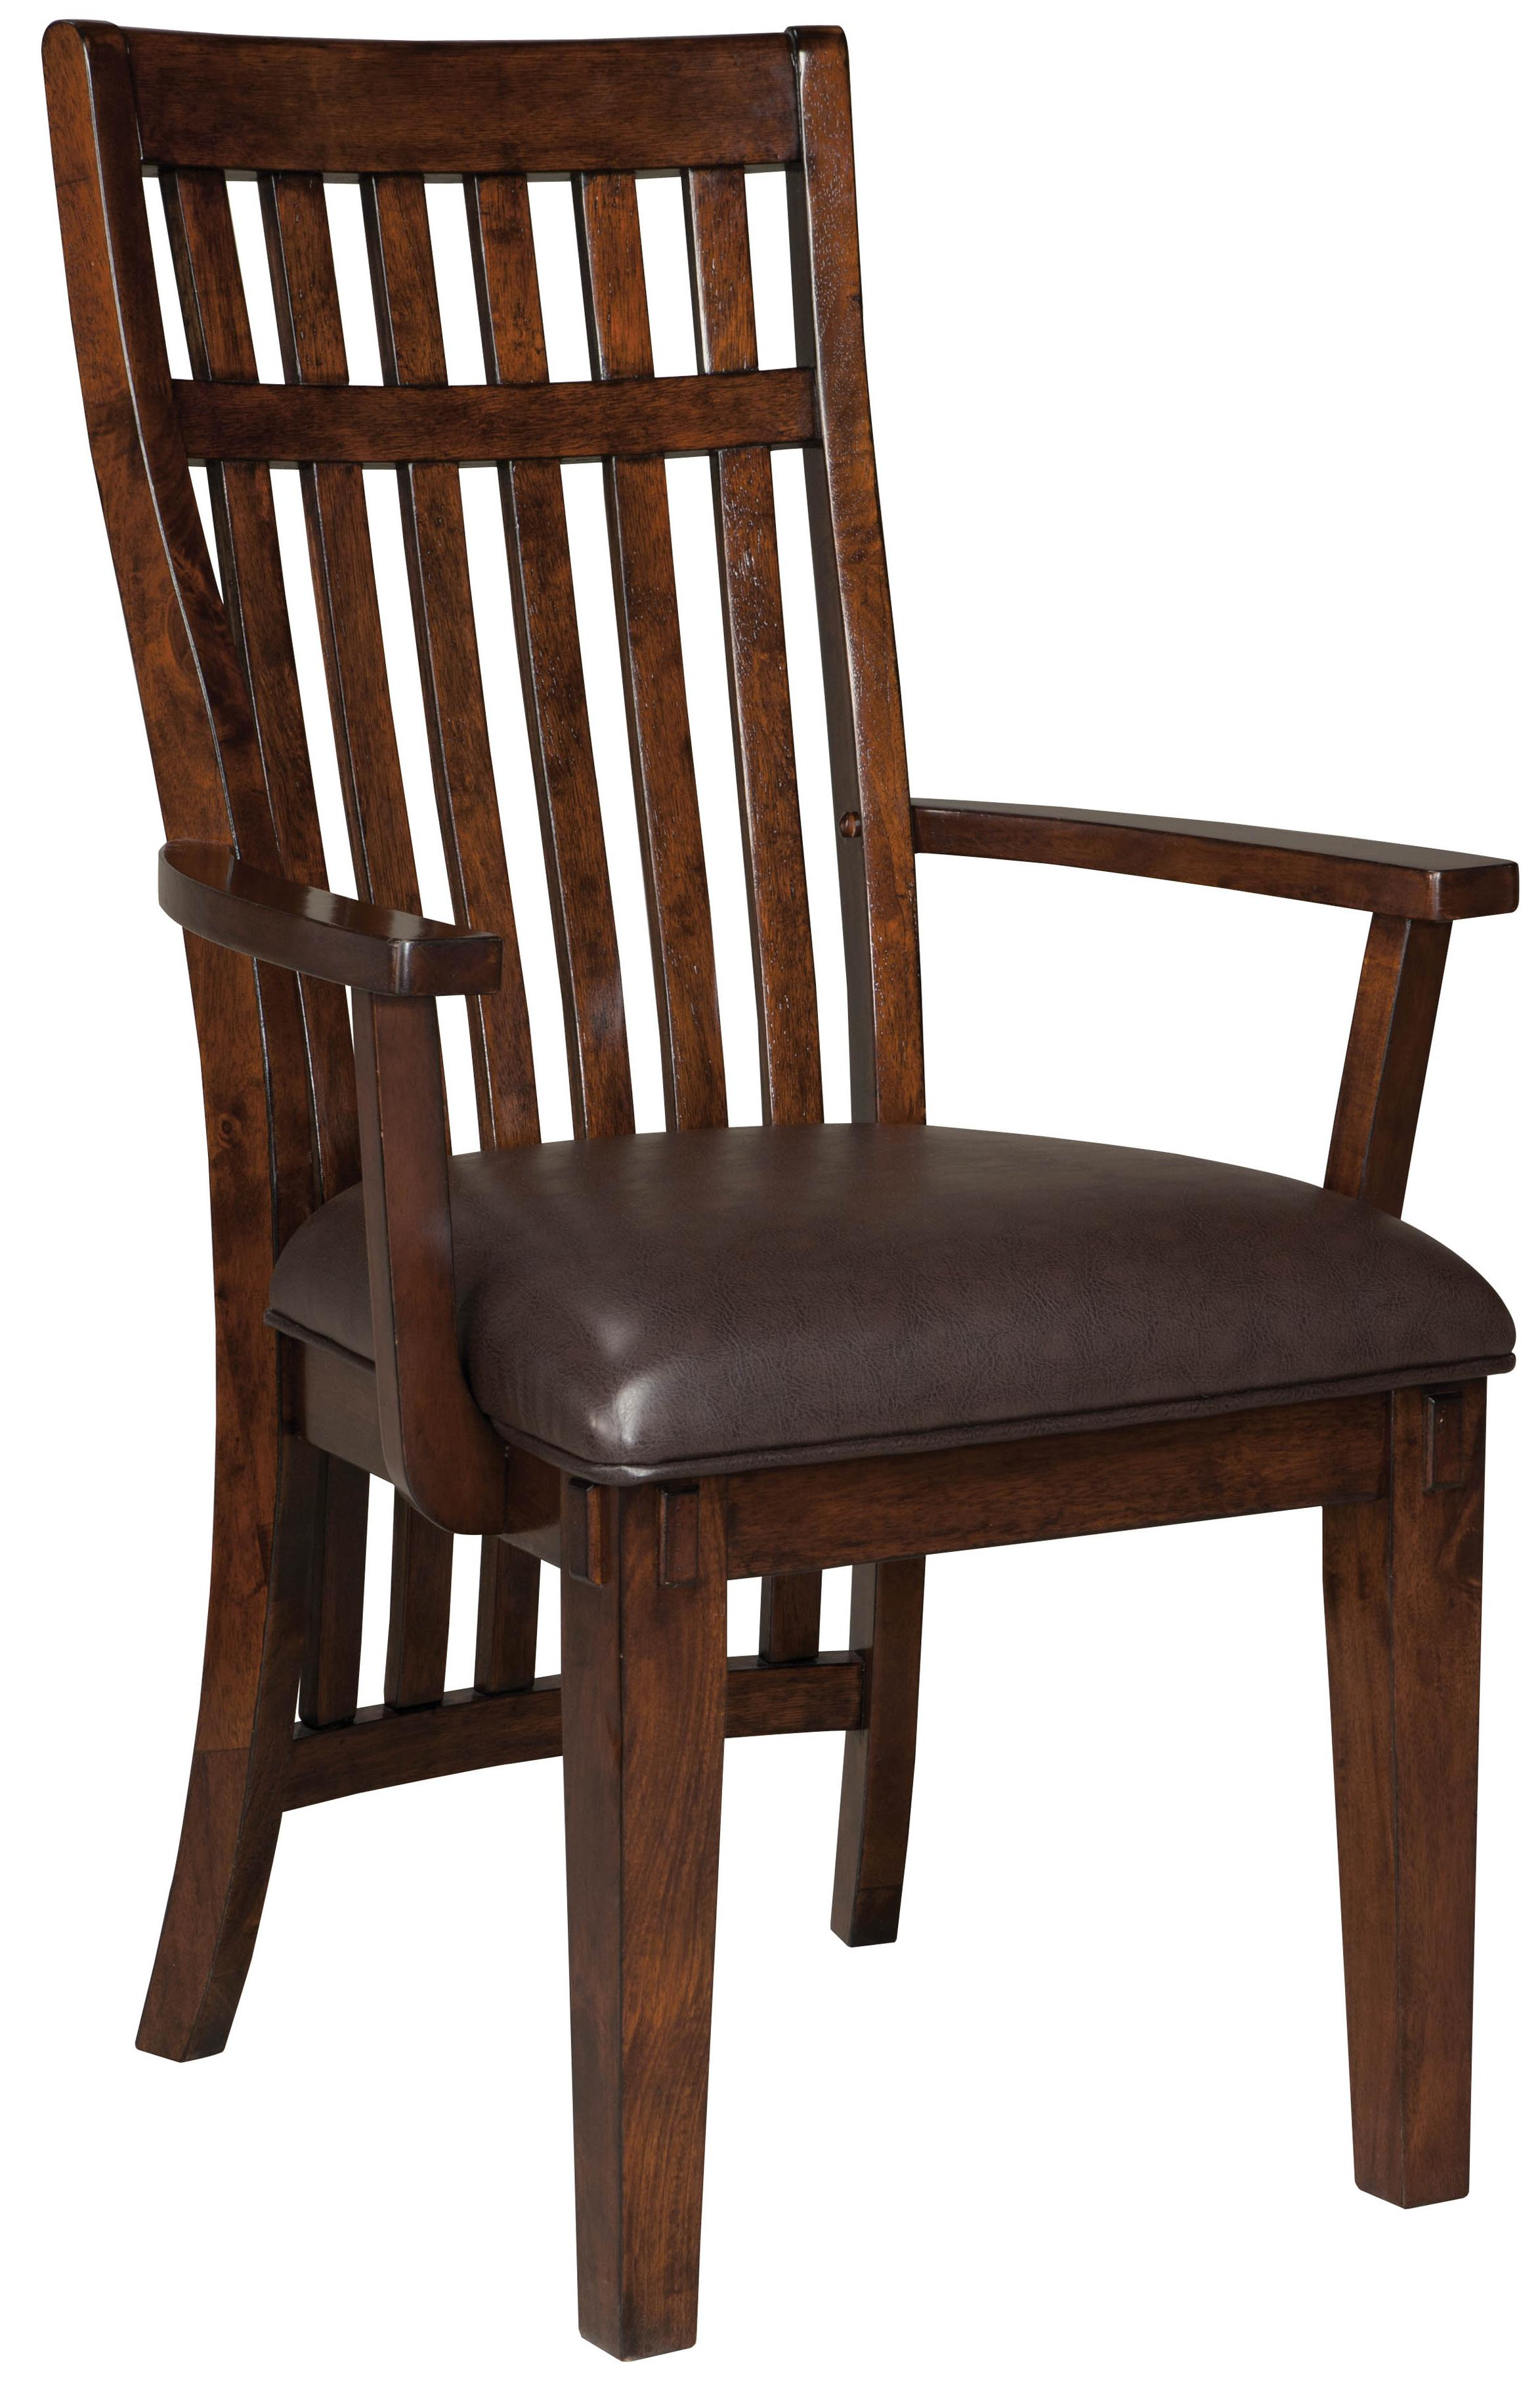 Standard Furniture Loft Upholstered Arm Chair With Vertical Ganged Slat Back